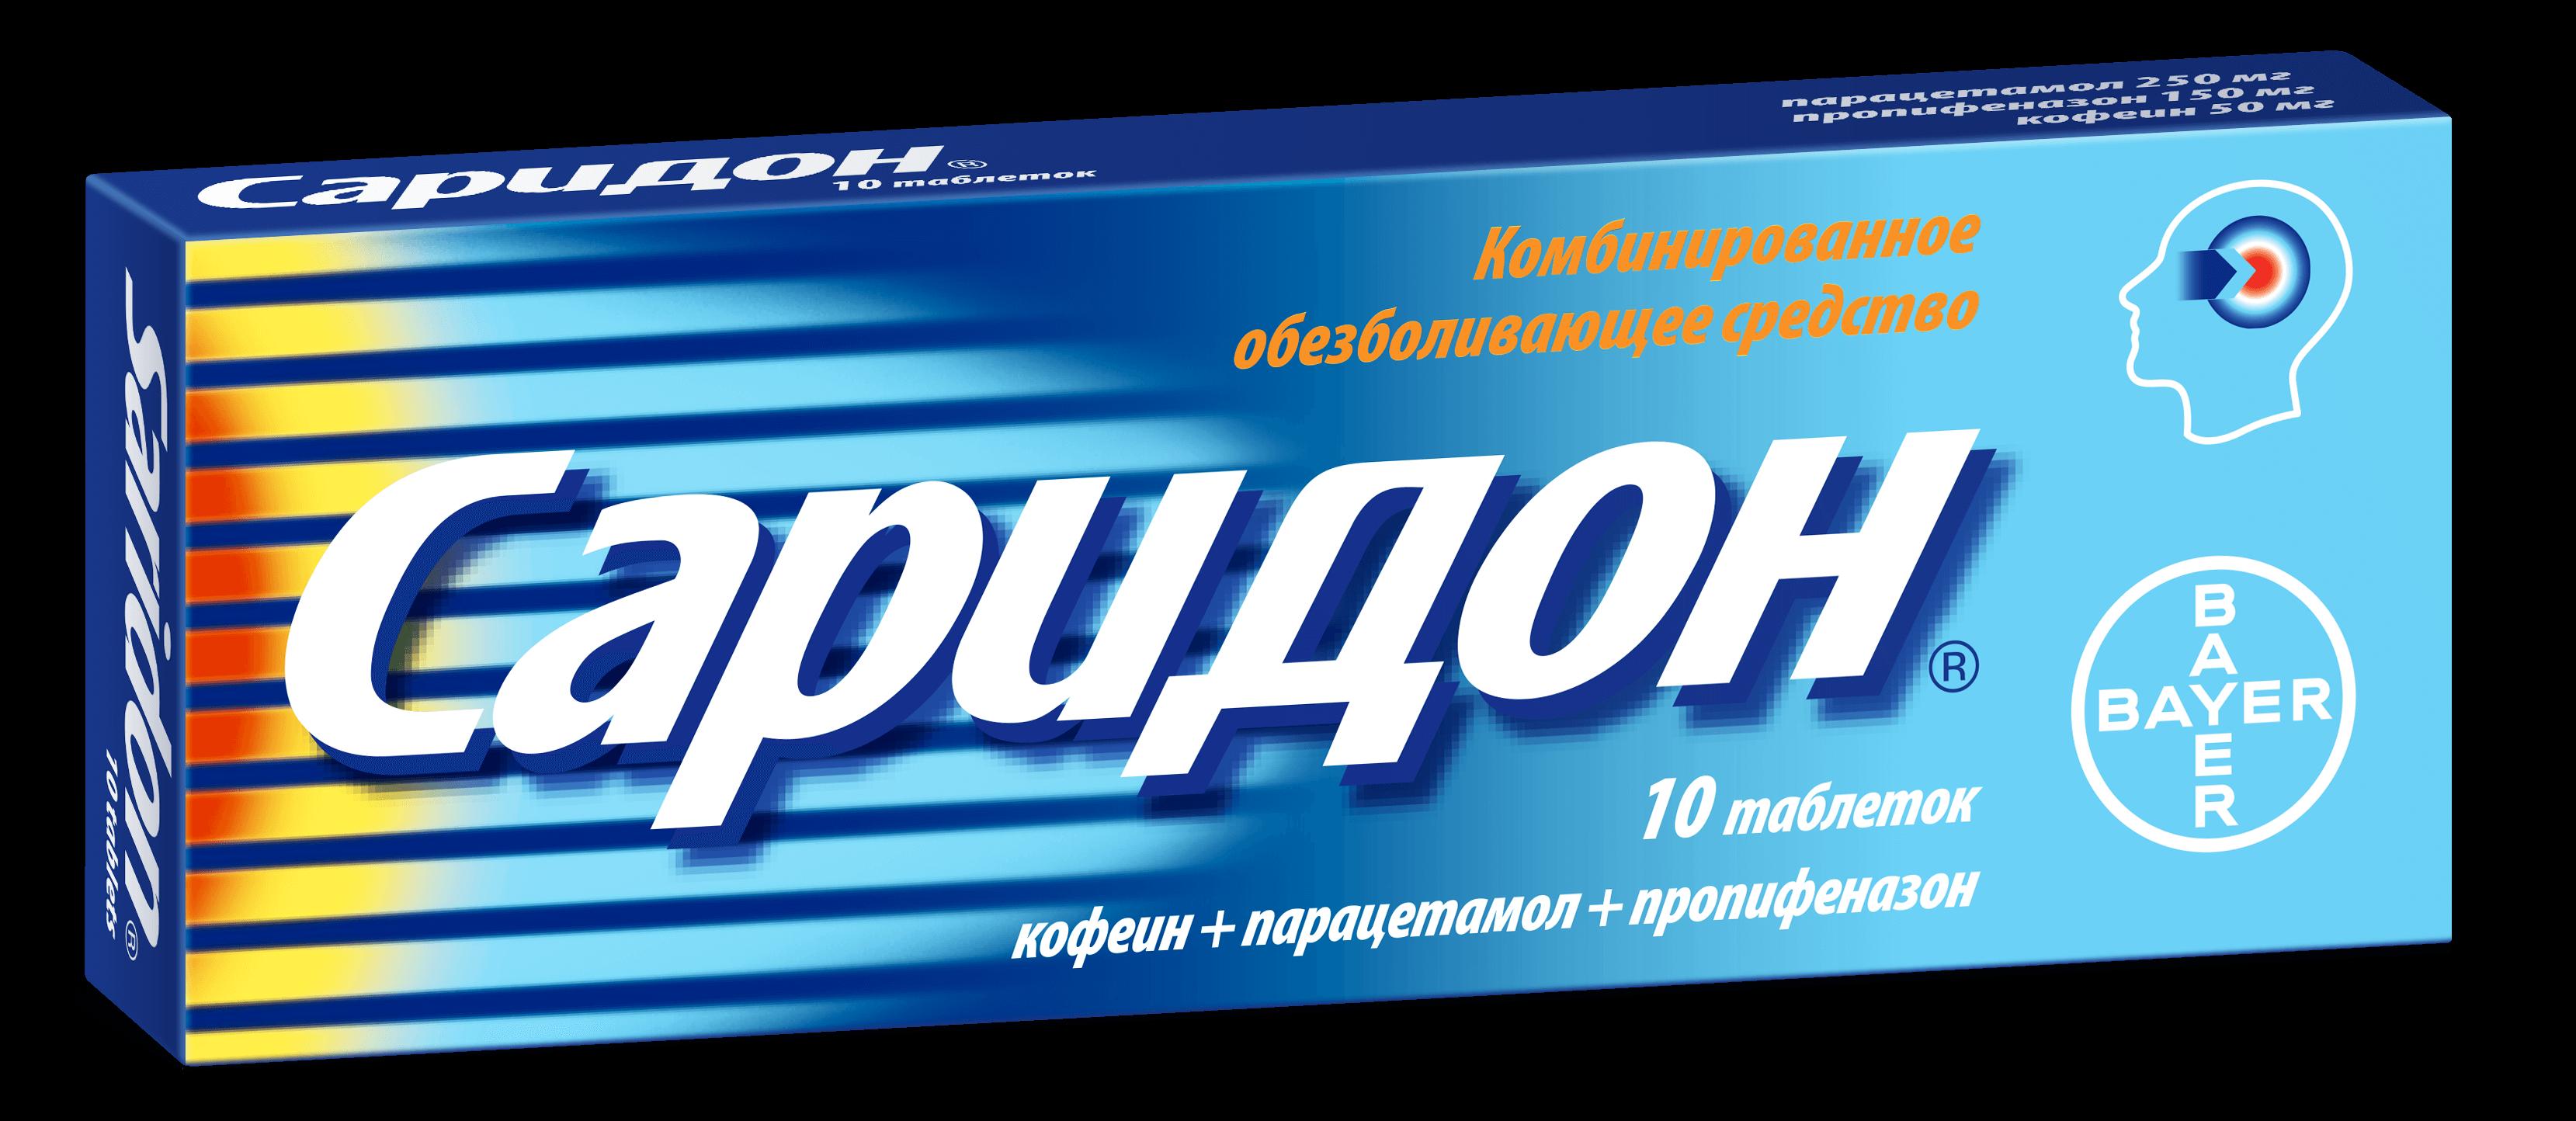 Саридон: инструкция по применению таблеток